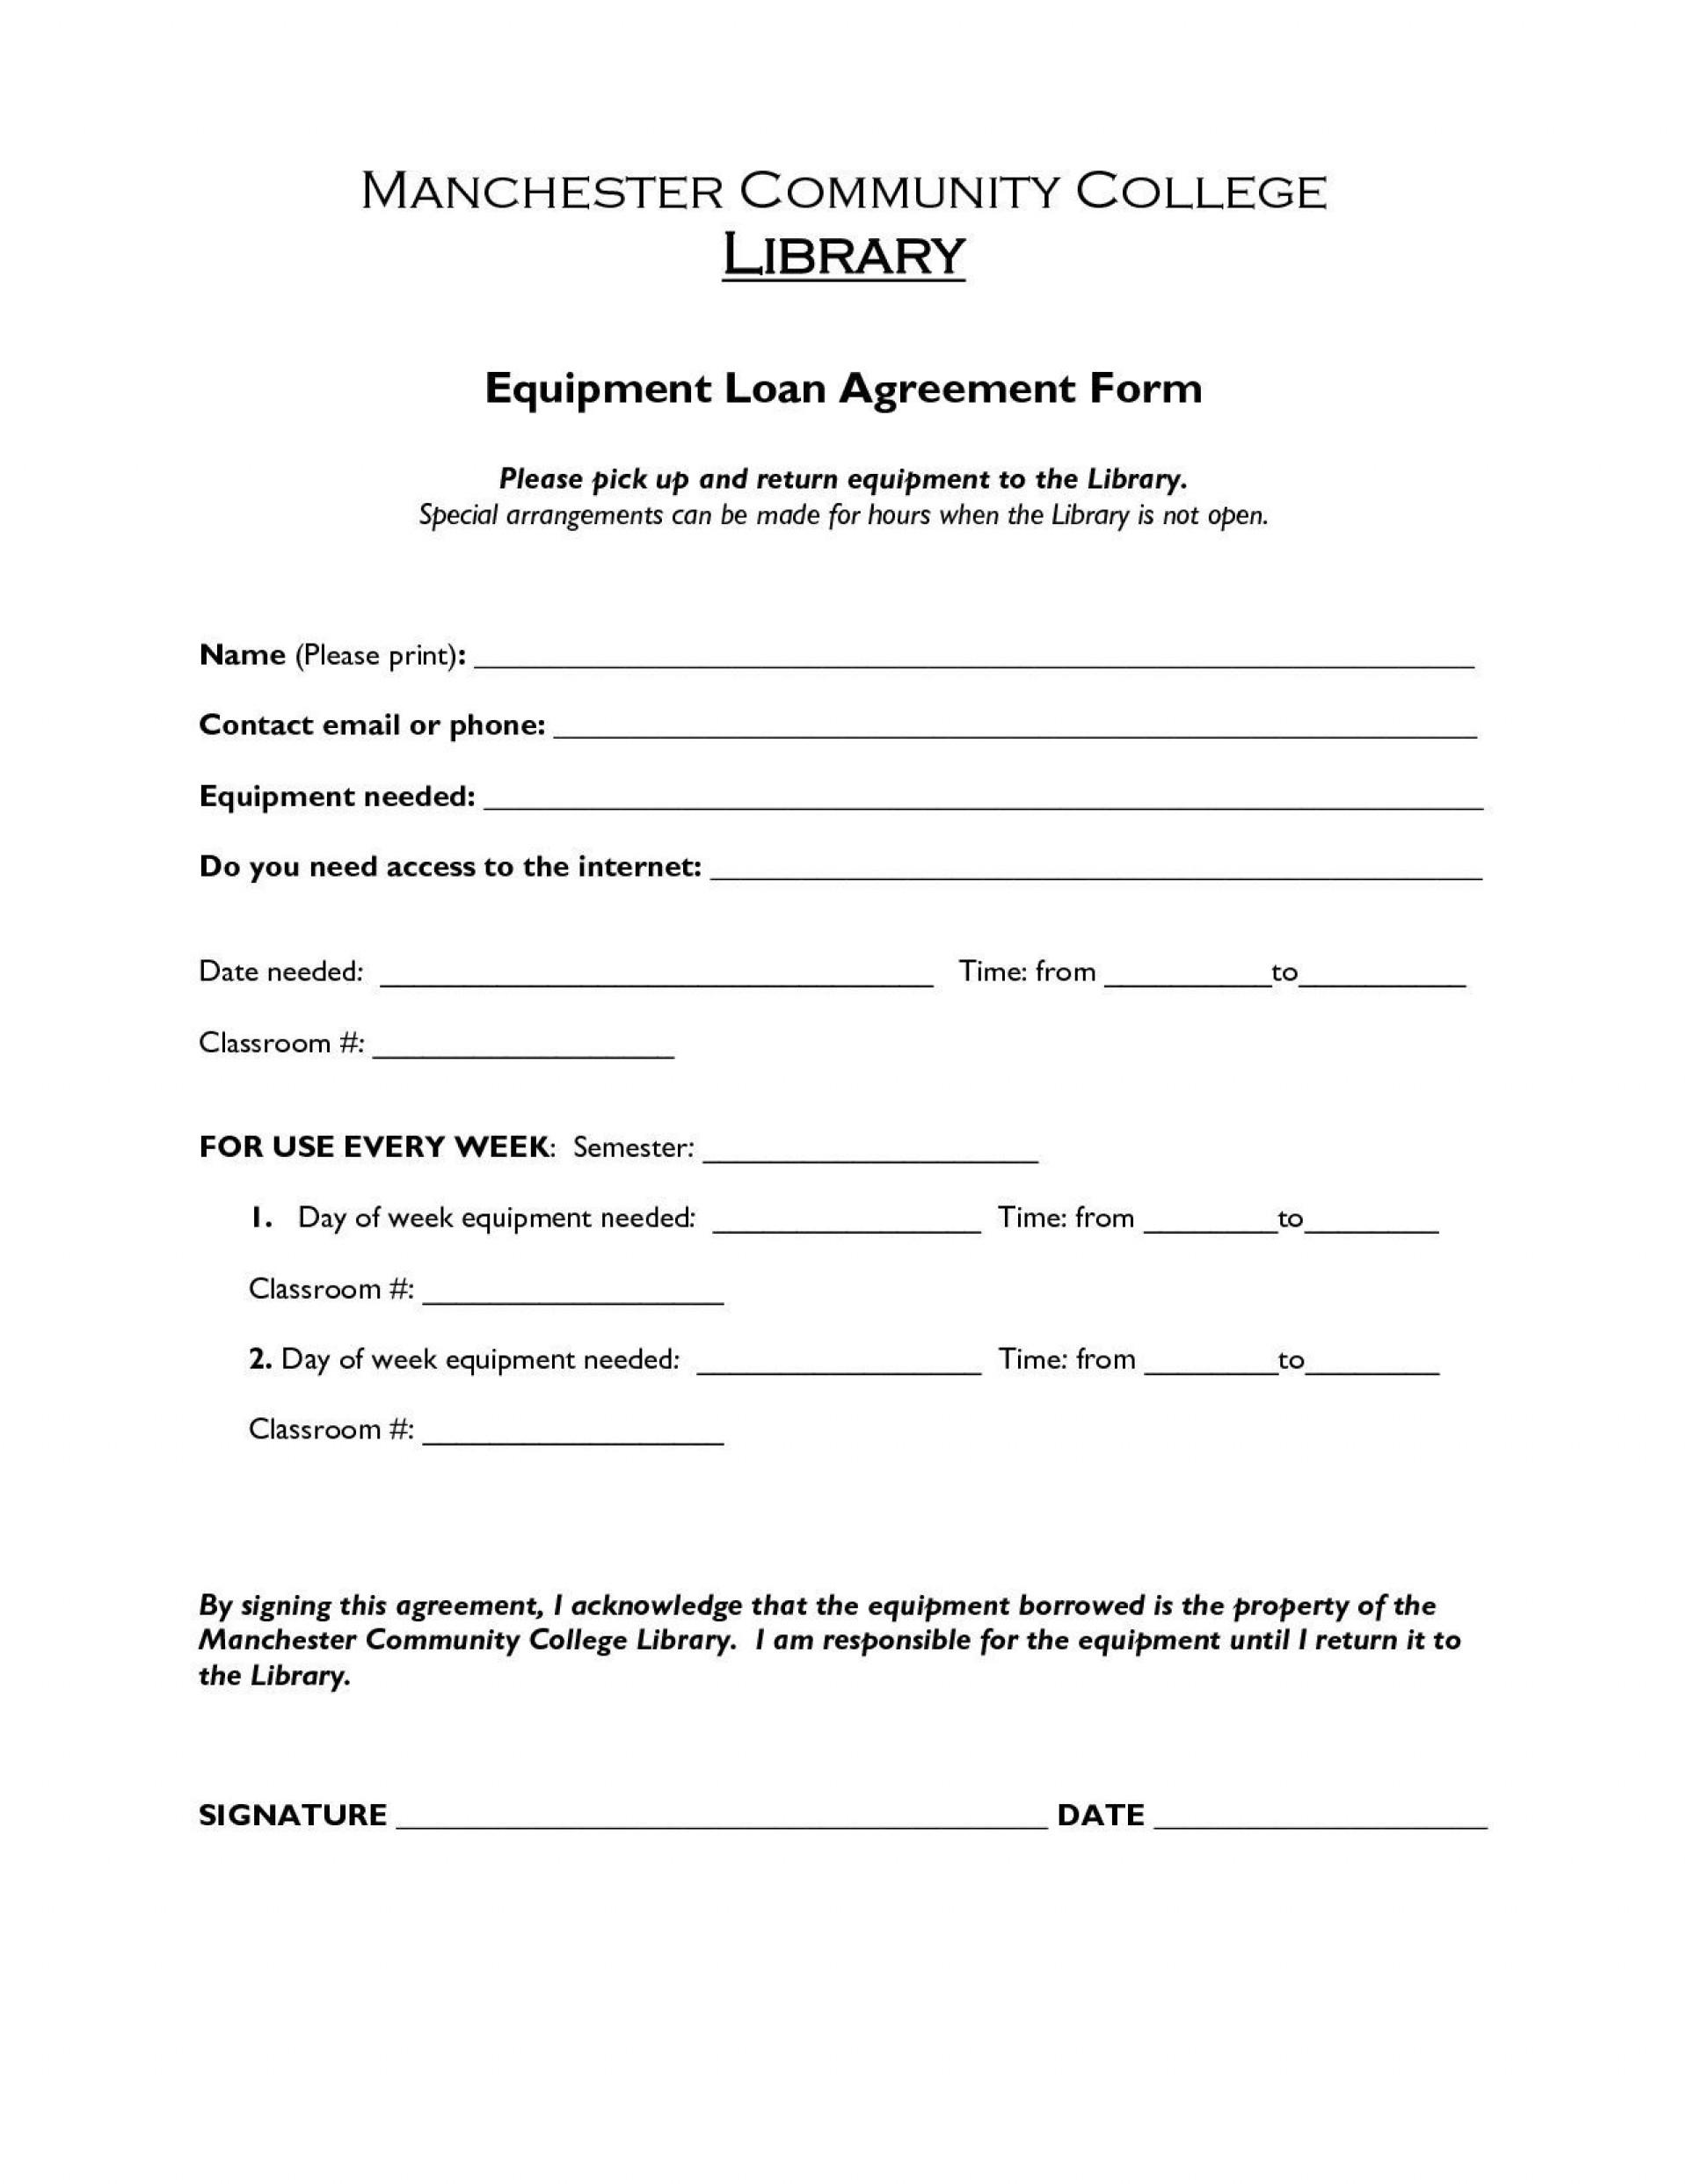 002 Striking Equipment Loan Agreement Template Highest Quality  Simple Uk Borrowing Free1920